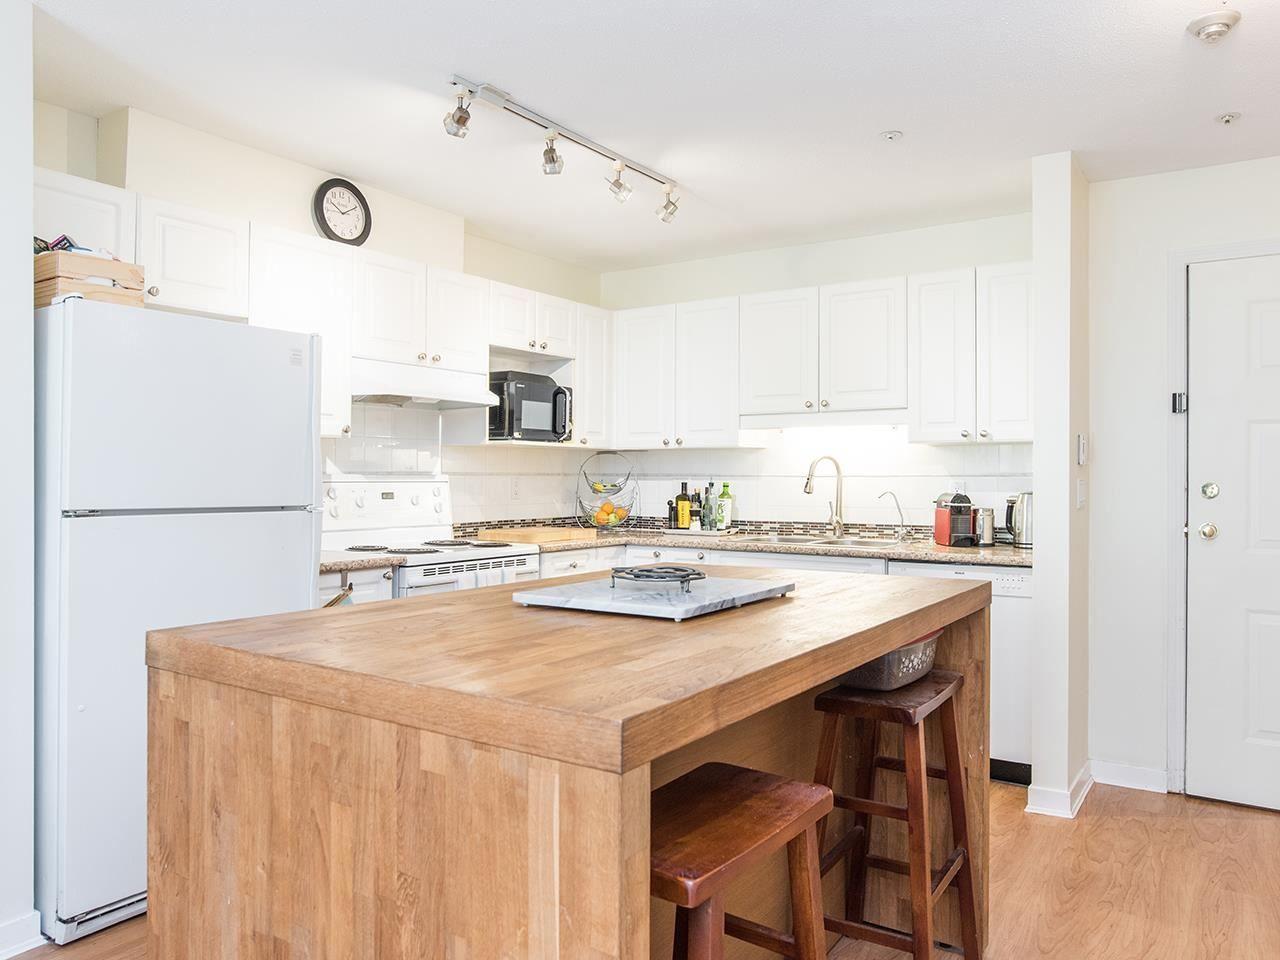 9688-148-street-guildford-north-surrey-08 at 306 - 9688 148 Street, Guildford, North Surrey